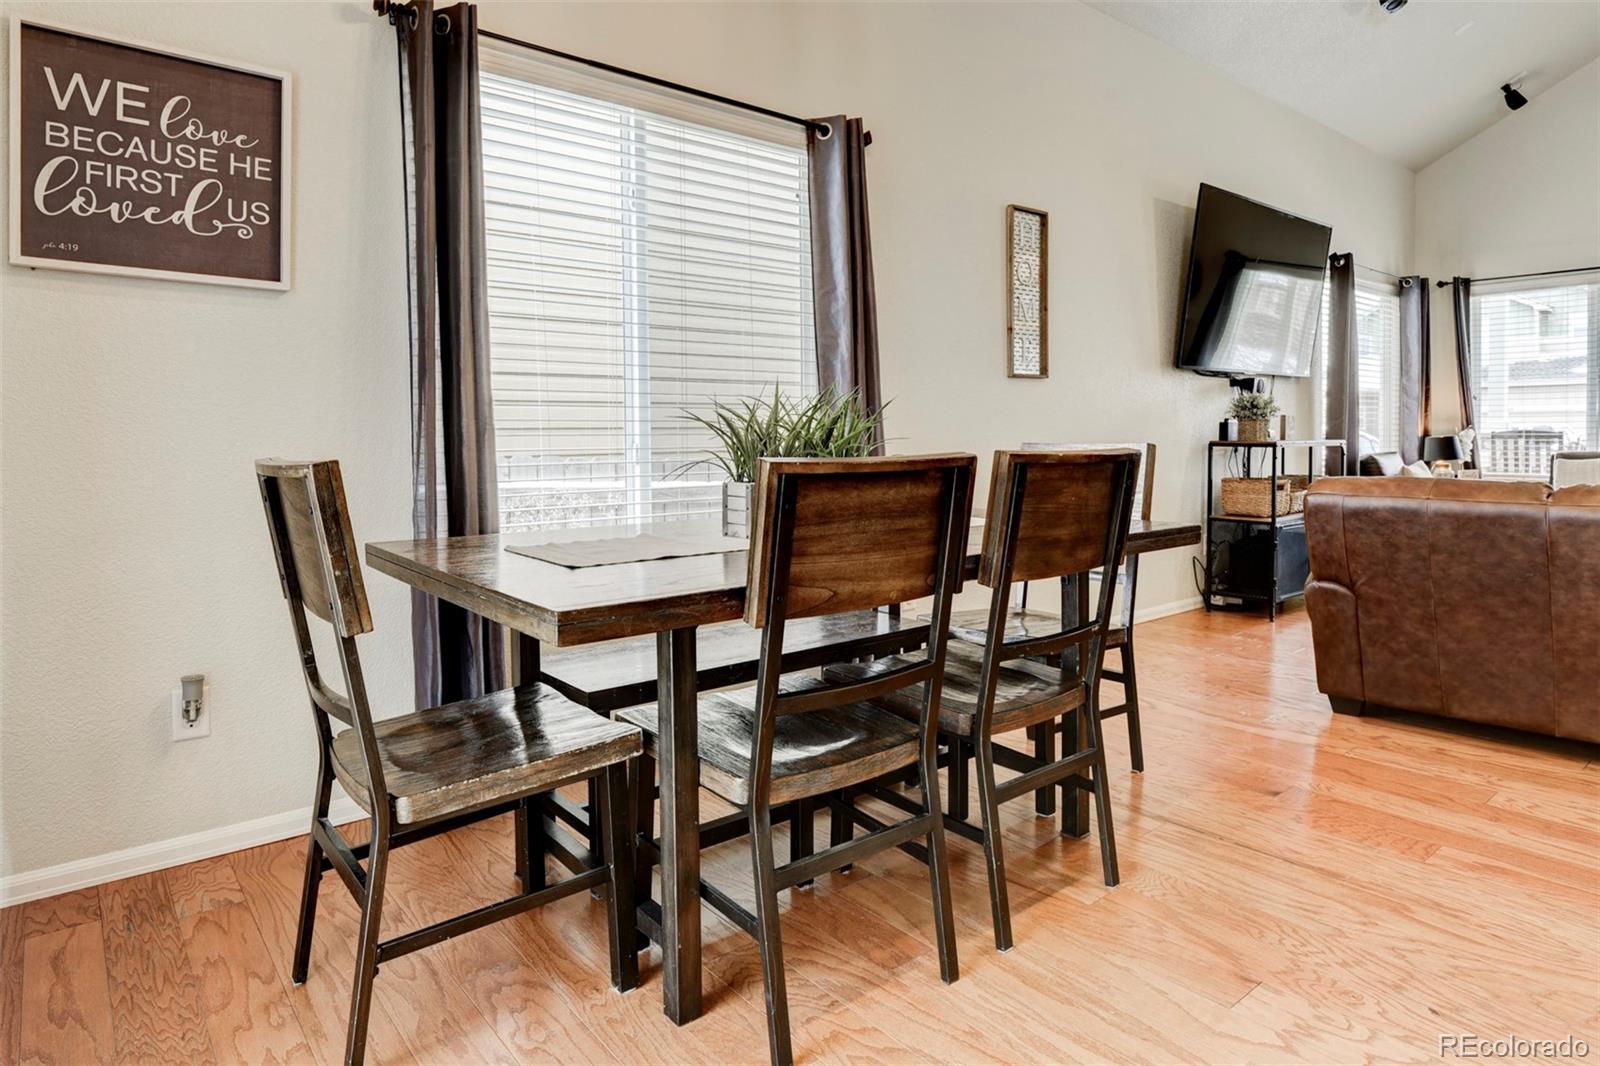 MLS# 7612924 - 11 - 6139 Rocking Chair Lane, Colorado Springs, CO 80925